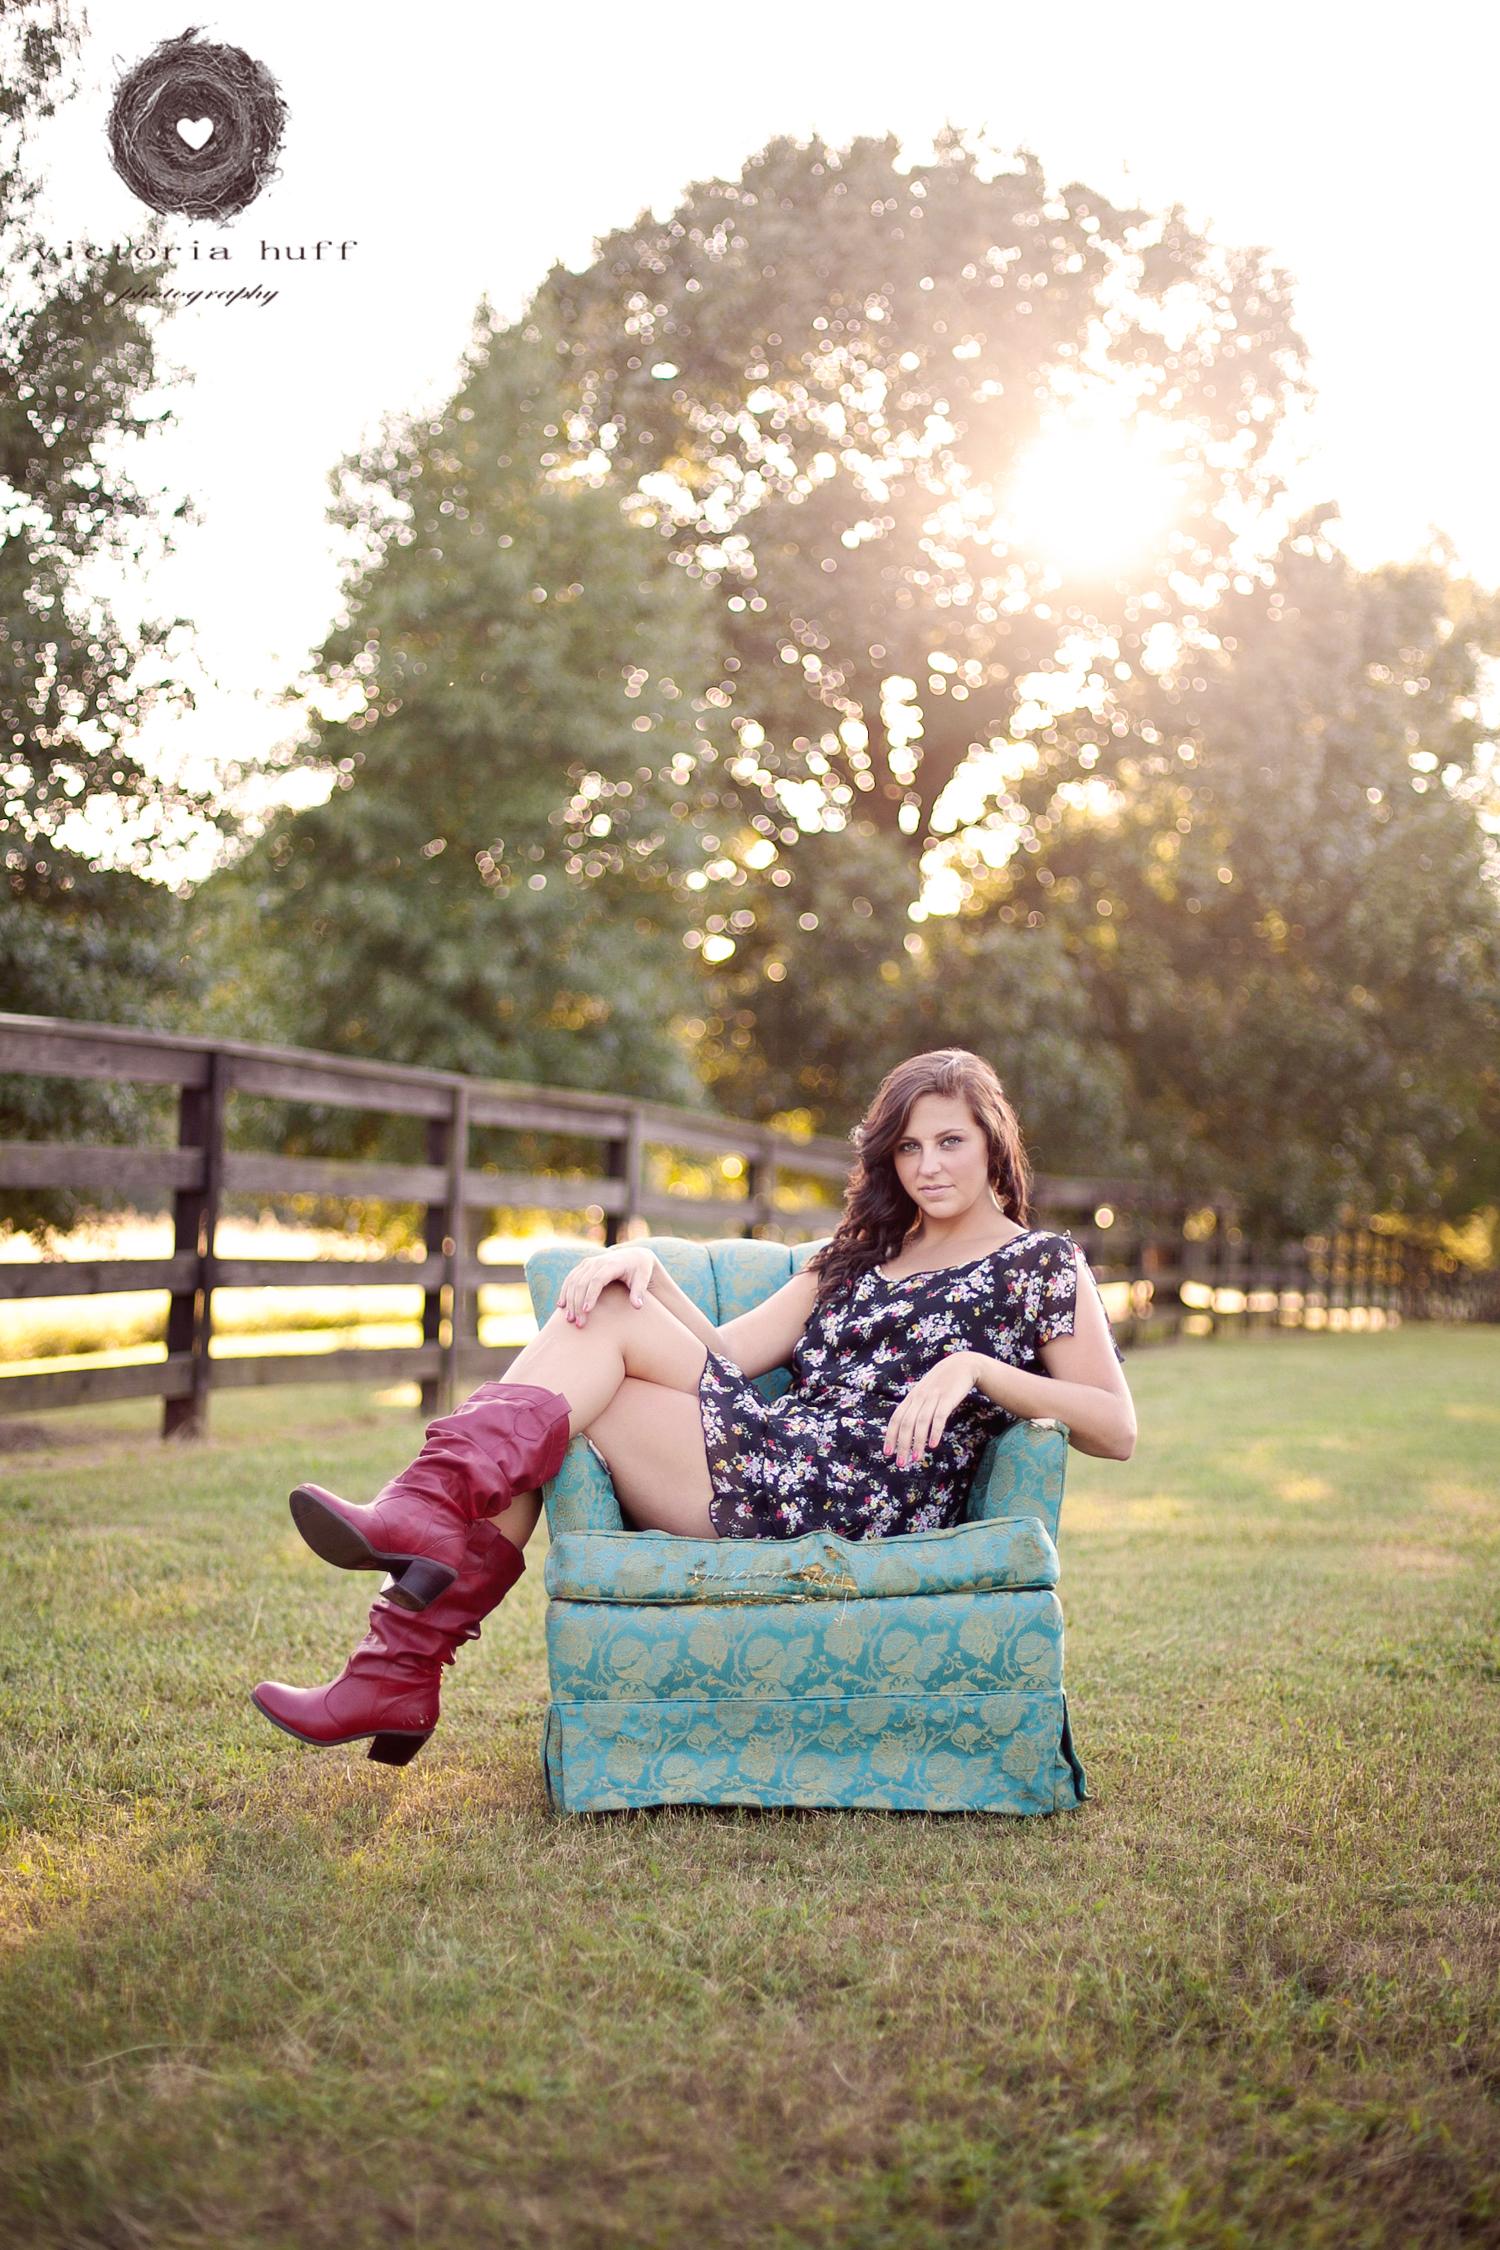 Sarah-Parr-Athens-Oconee-Georgia-Senior-Portraits-North-Oconee-High-School-Photography-079.jpg